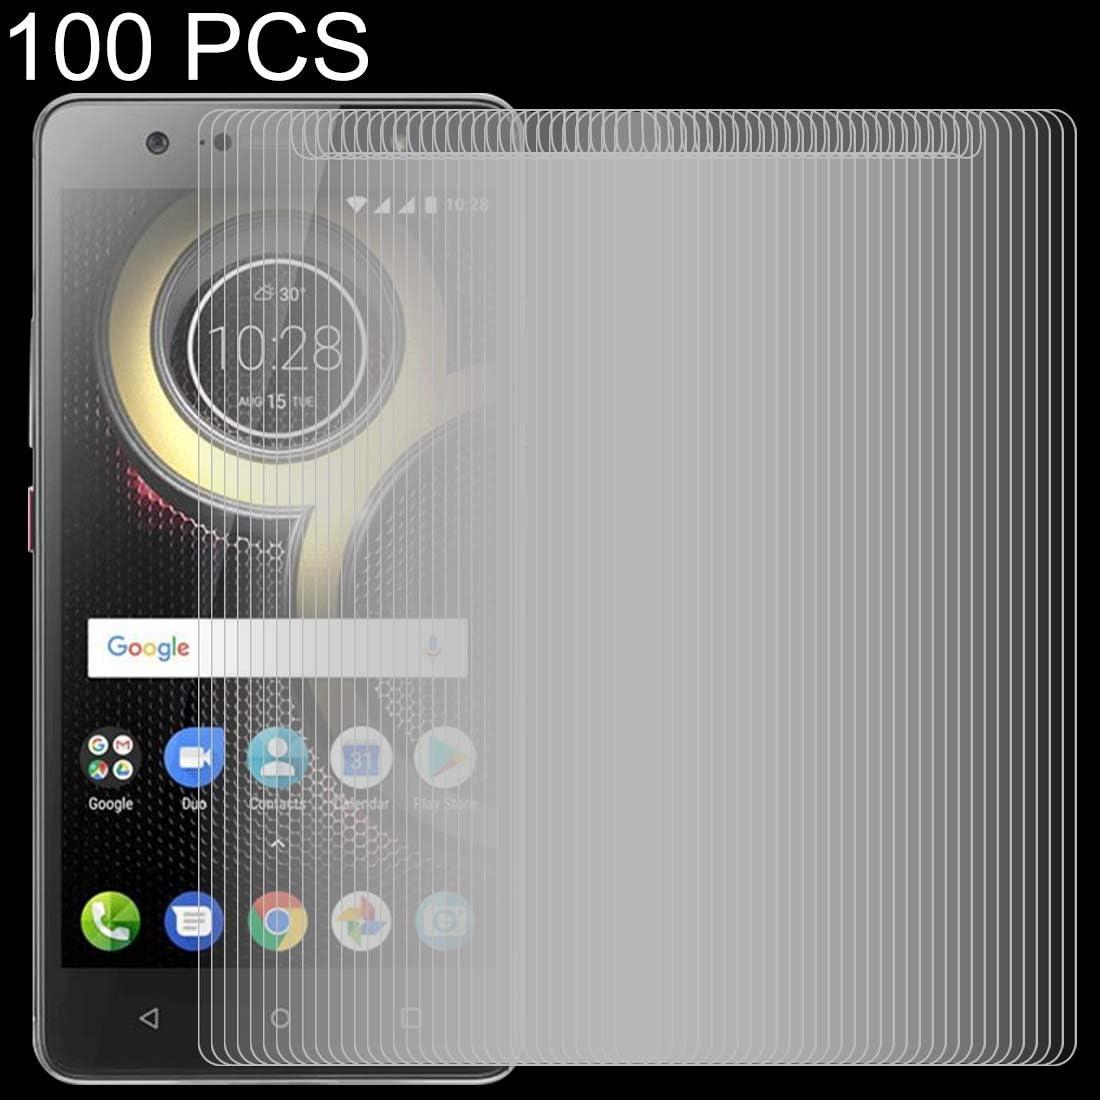 GUOSHU Premium Tempered Glass Screen Film 100 PCS 0.26mm 9H 2.5D Tempered Glass Film for Lenovo K8 Plus Anti-Scratch Screen Protector